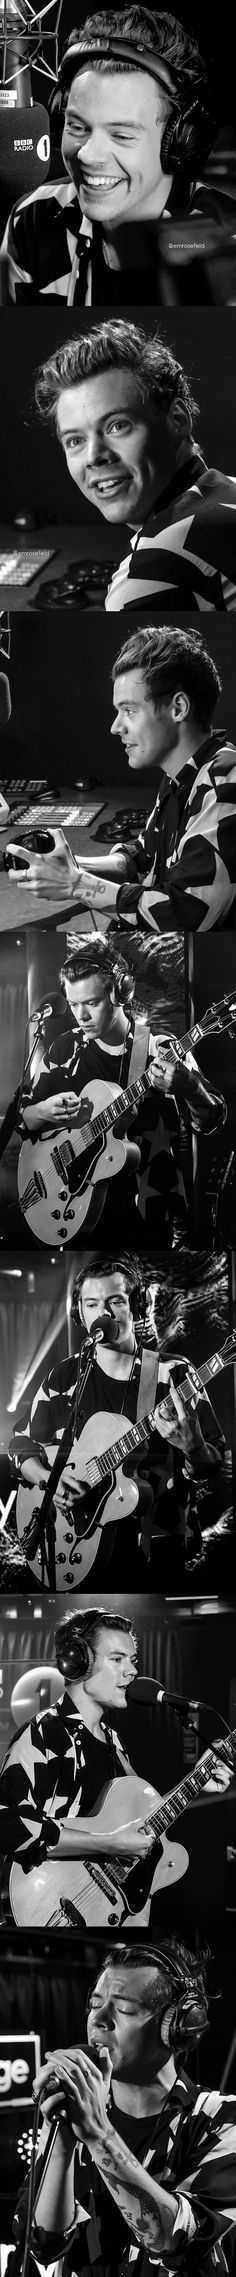 Harry Styles | BBC R1 Live Lounge 9.11.17 | emrosefeld |